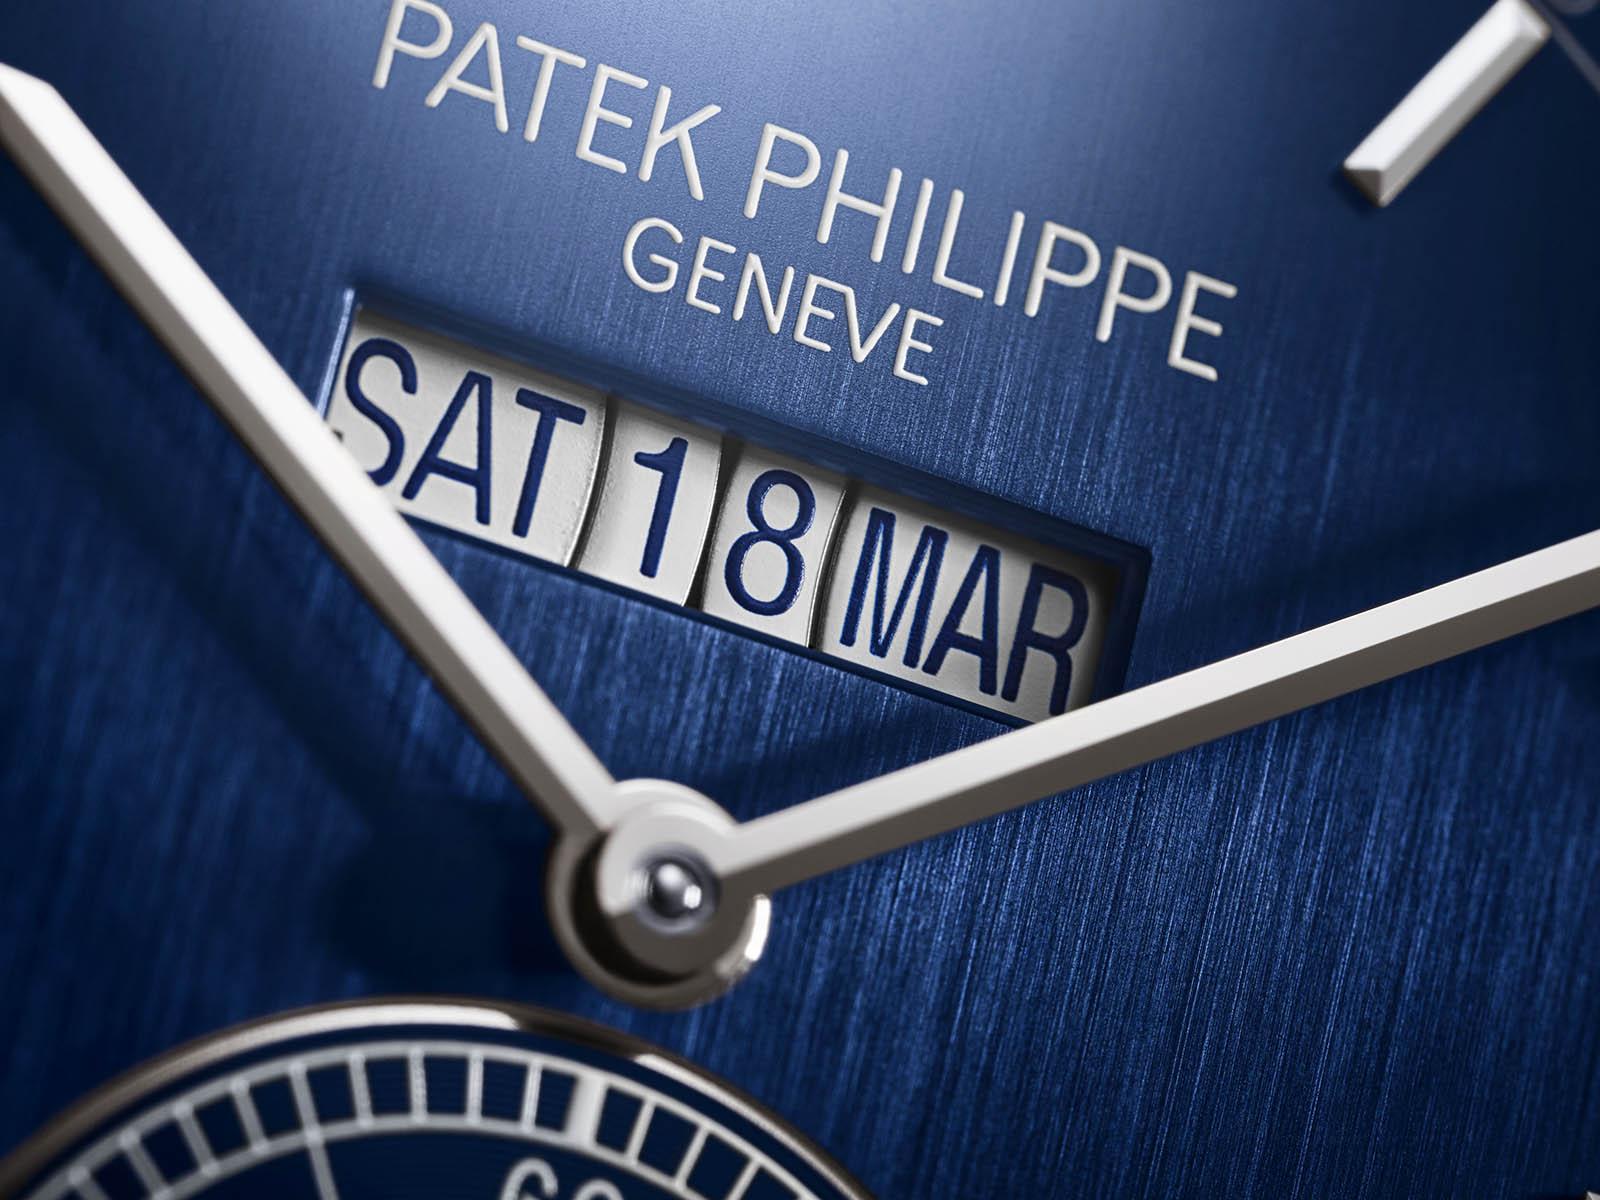 5236p-001-patek-philippe-in-line-perpetual-calendar-10.jpg